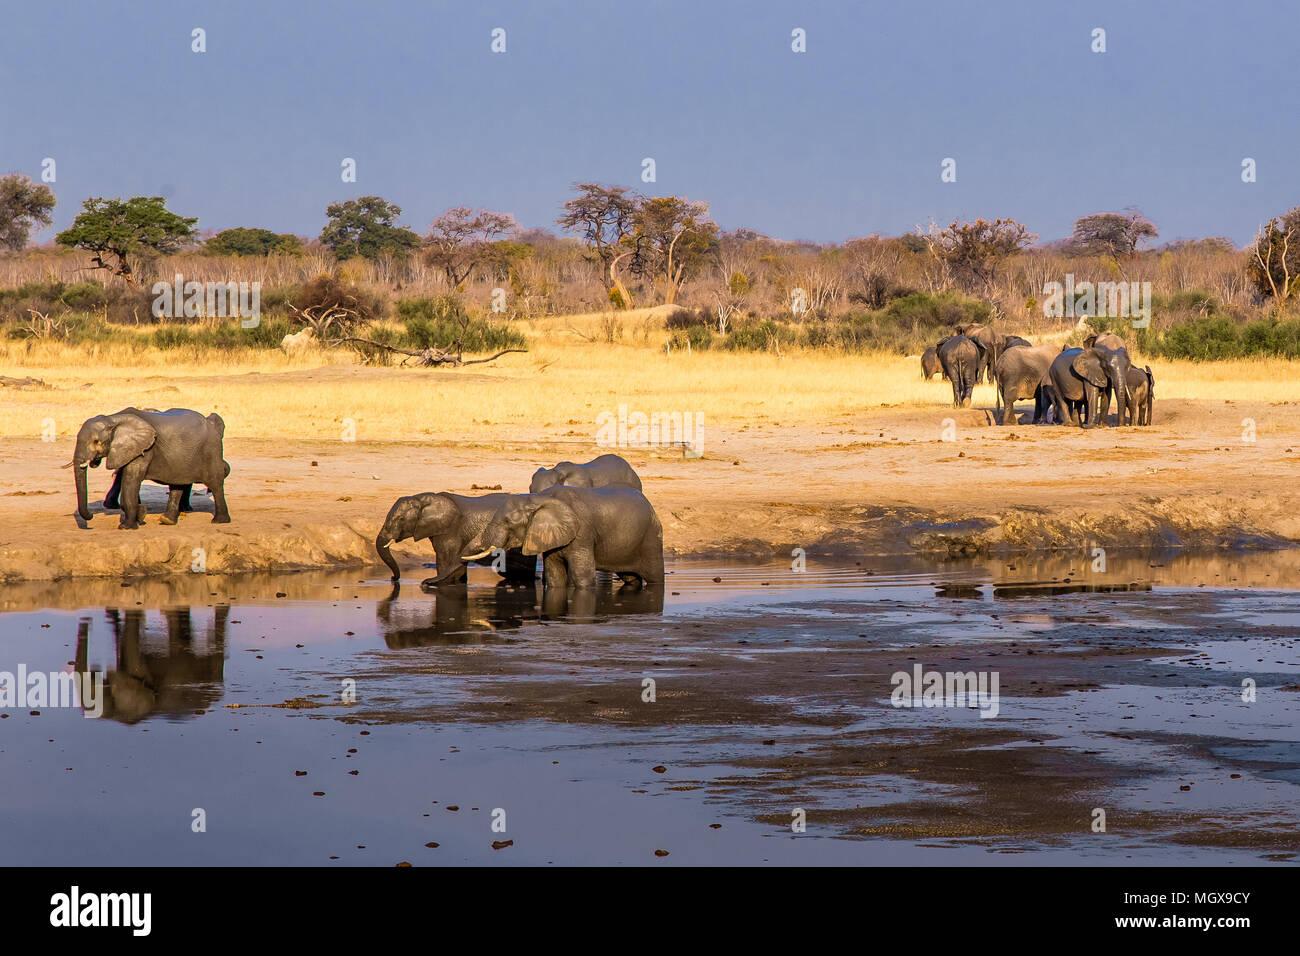 Elephants gather around a shrinking waterhole during a drought in Hwange National Park, Zimbabwe, September 9, 2016. Stock Photo